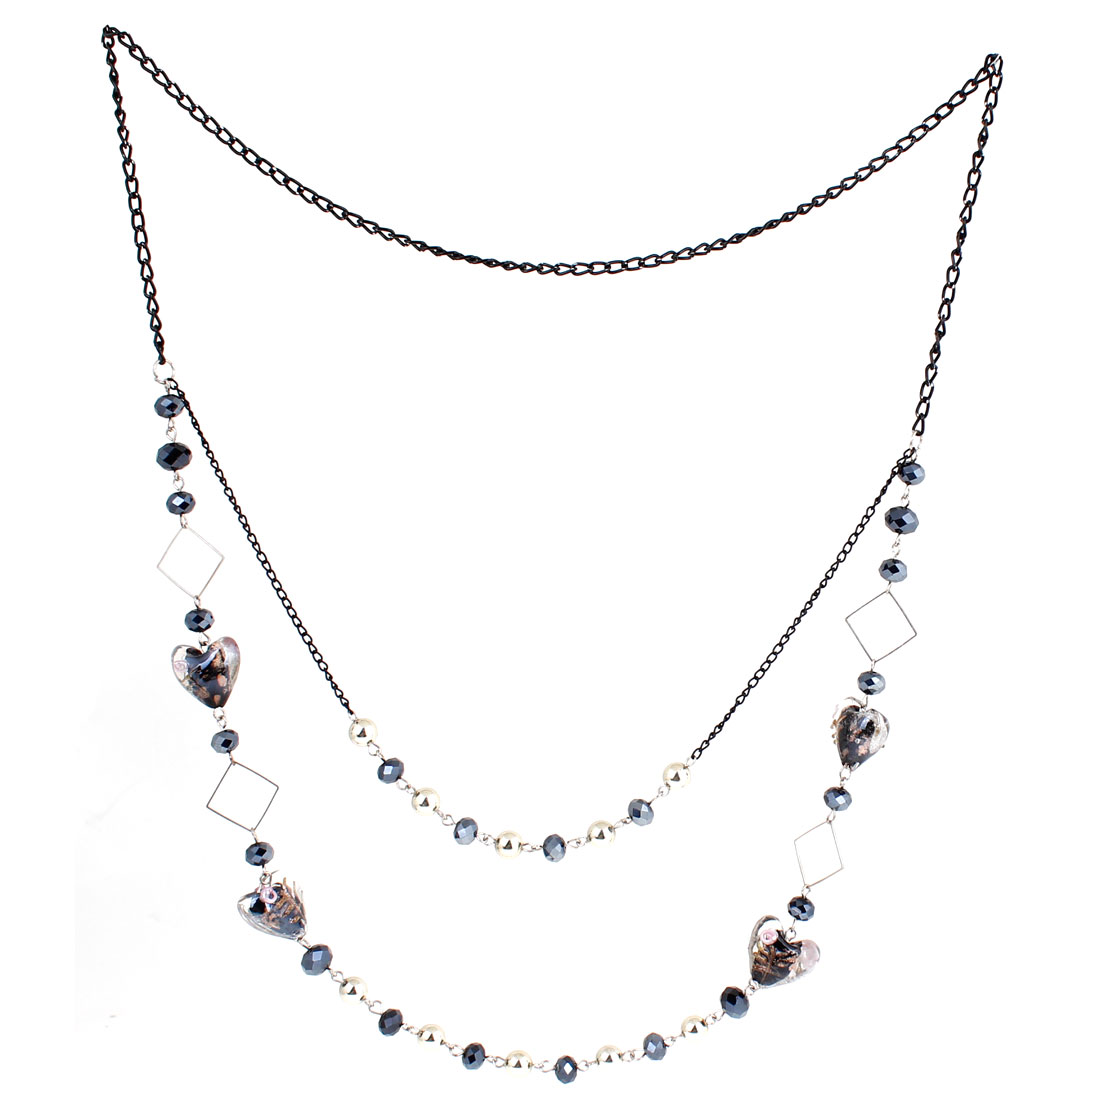 Ladies Dark Blue Faux Crystals Accent Black Slim Chain Sweater Necklace